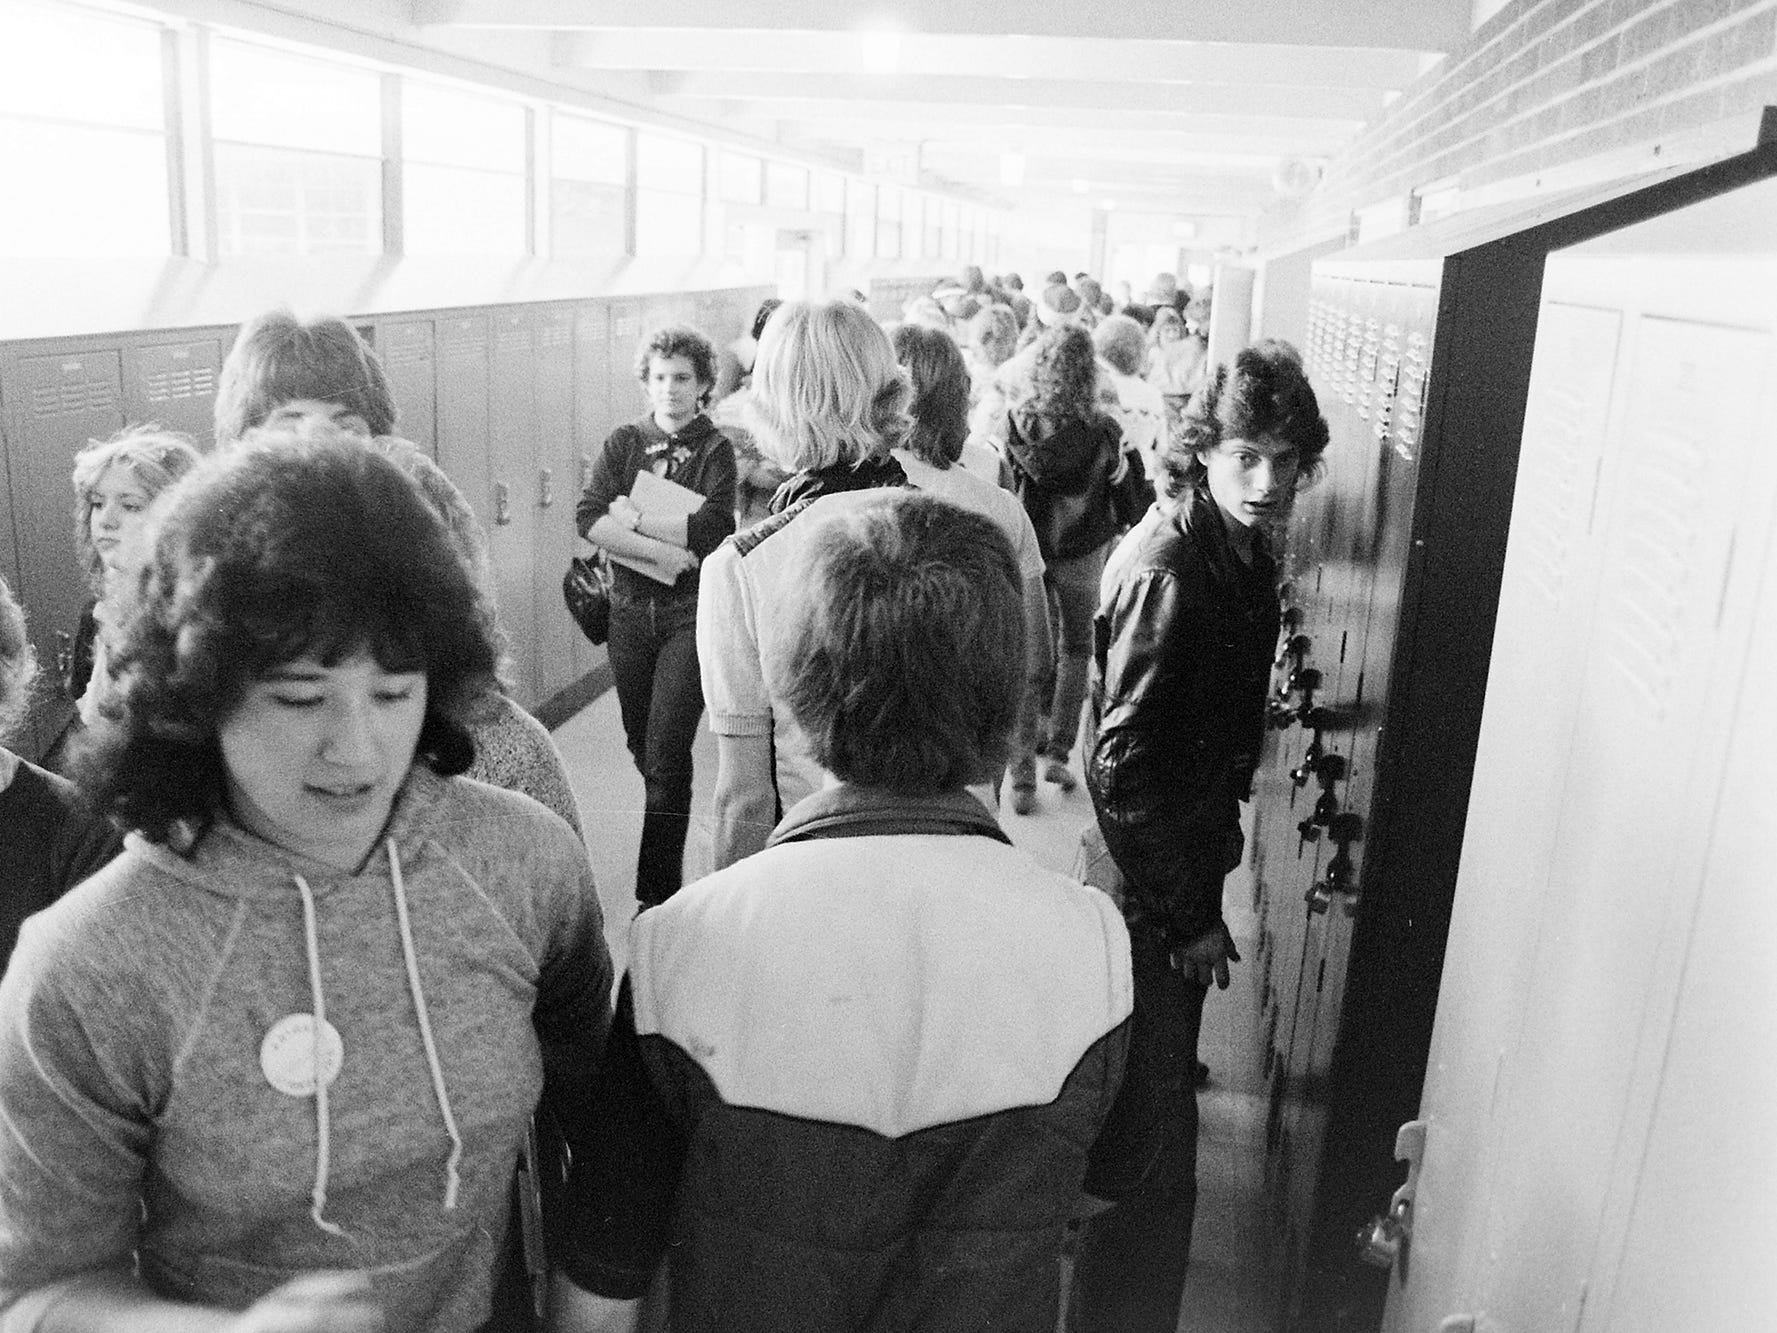 03/23/84Bremerton High Hallway